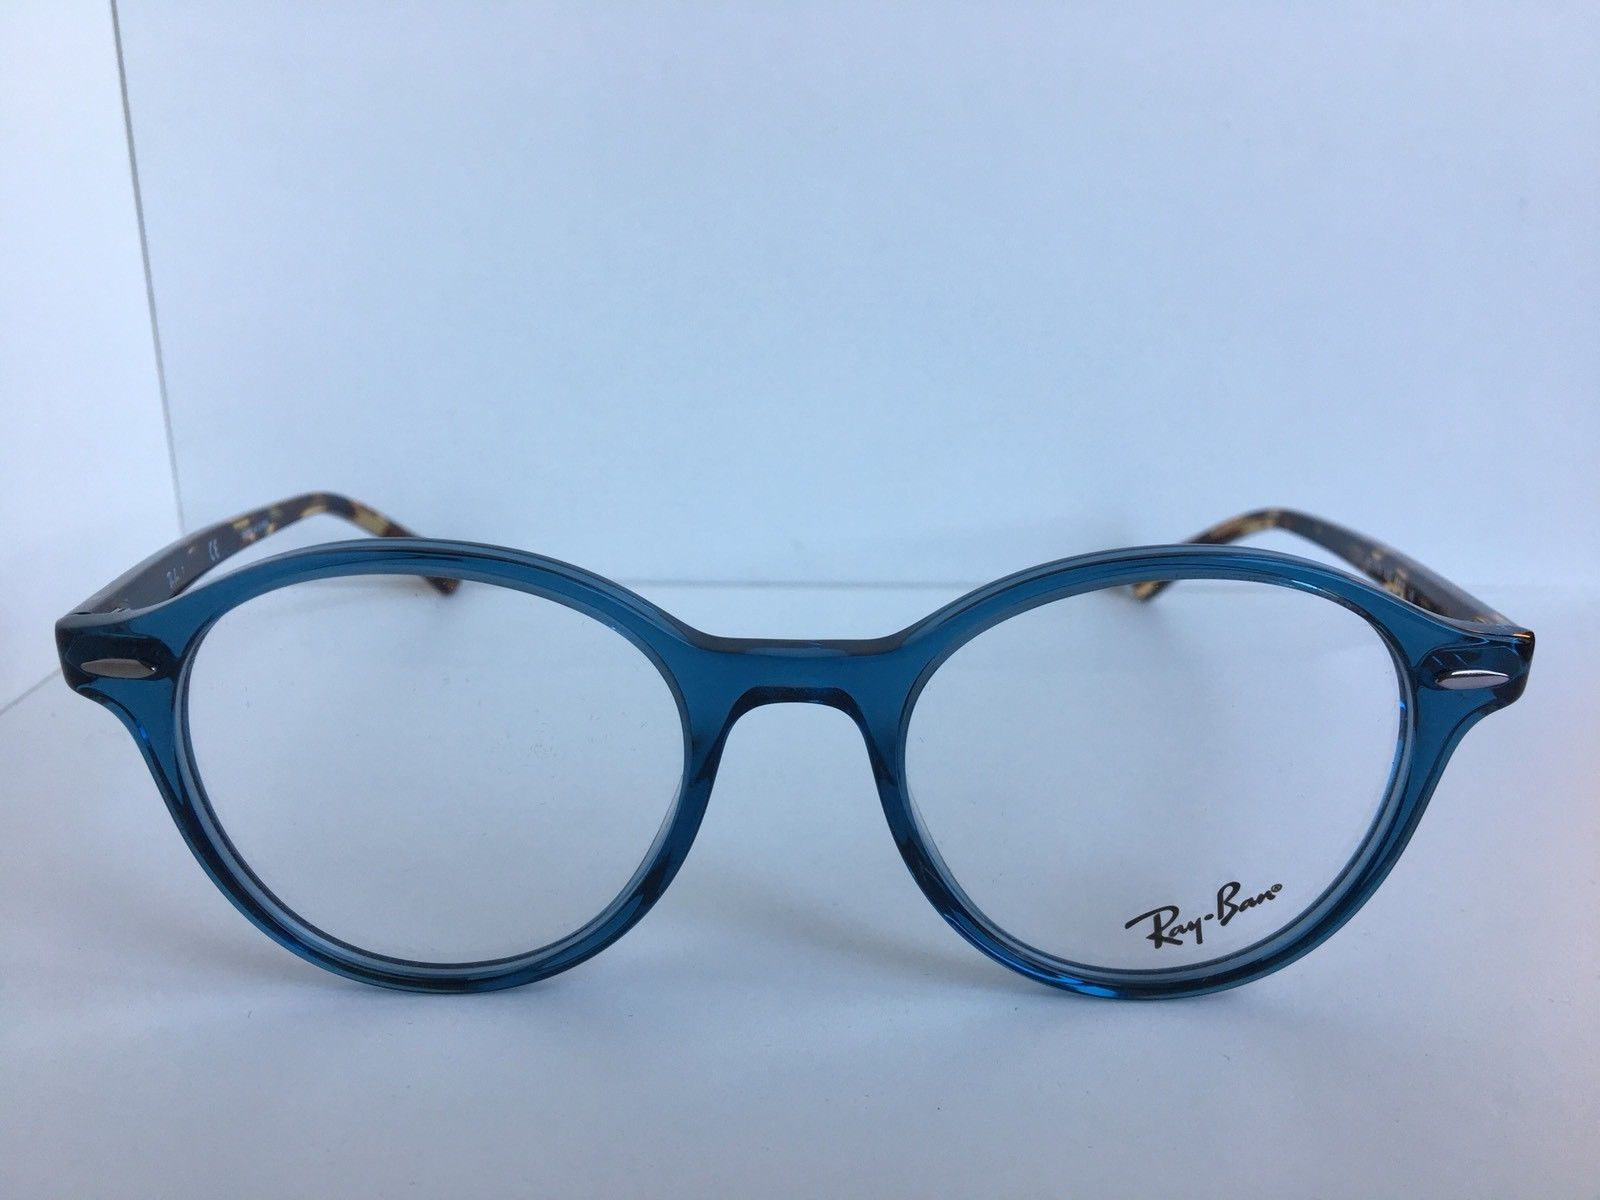 55e85bb56f7 ... New Ray-Ban RB 7118 RB7118 8022 48mm Rx Round Blue Havana Eyeglasses  Frames ...